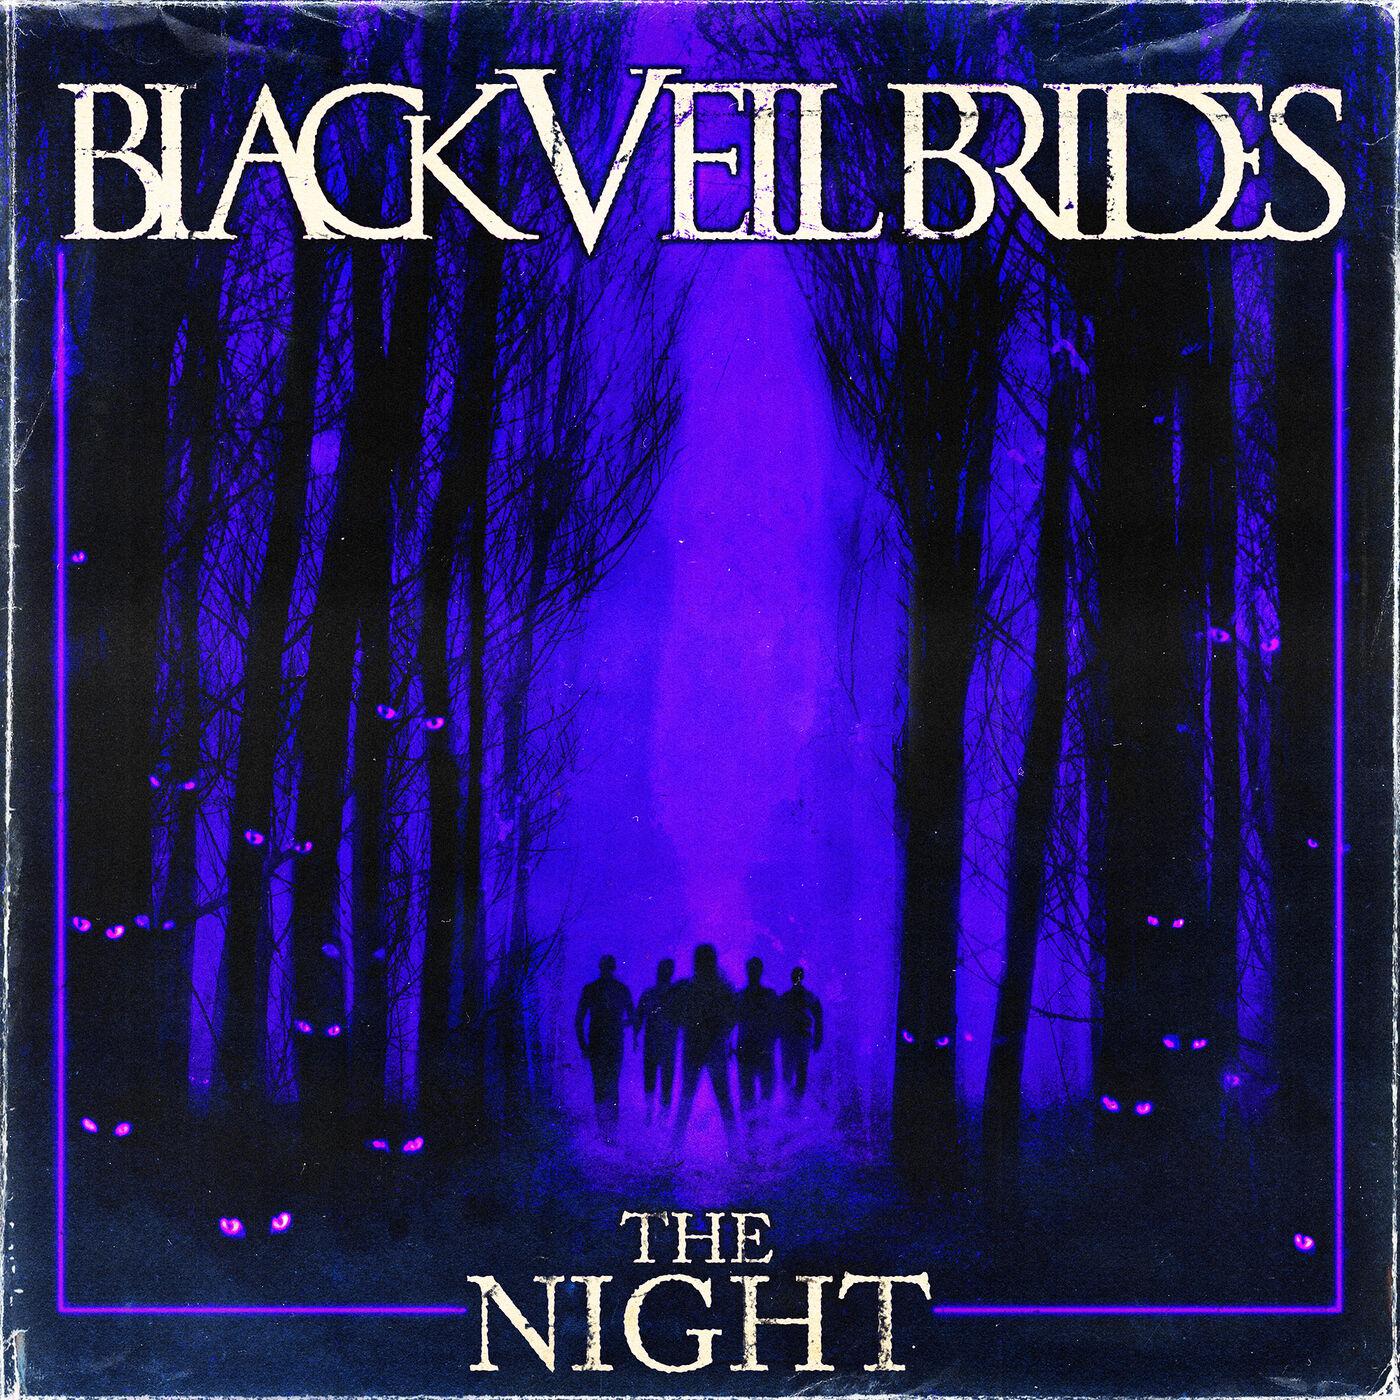 Black Veil Brides - The Night [single] (2019)